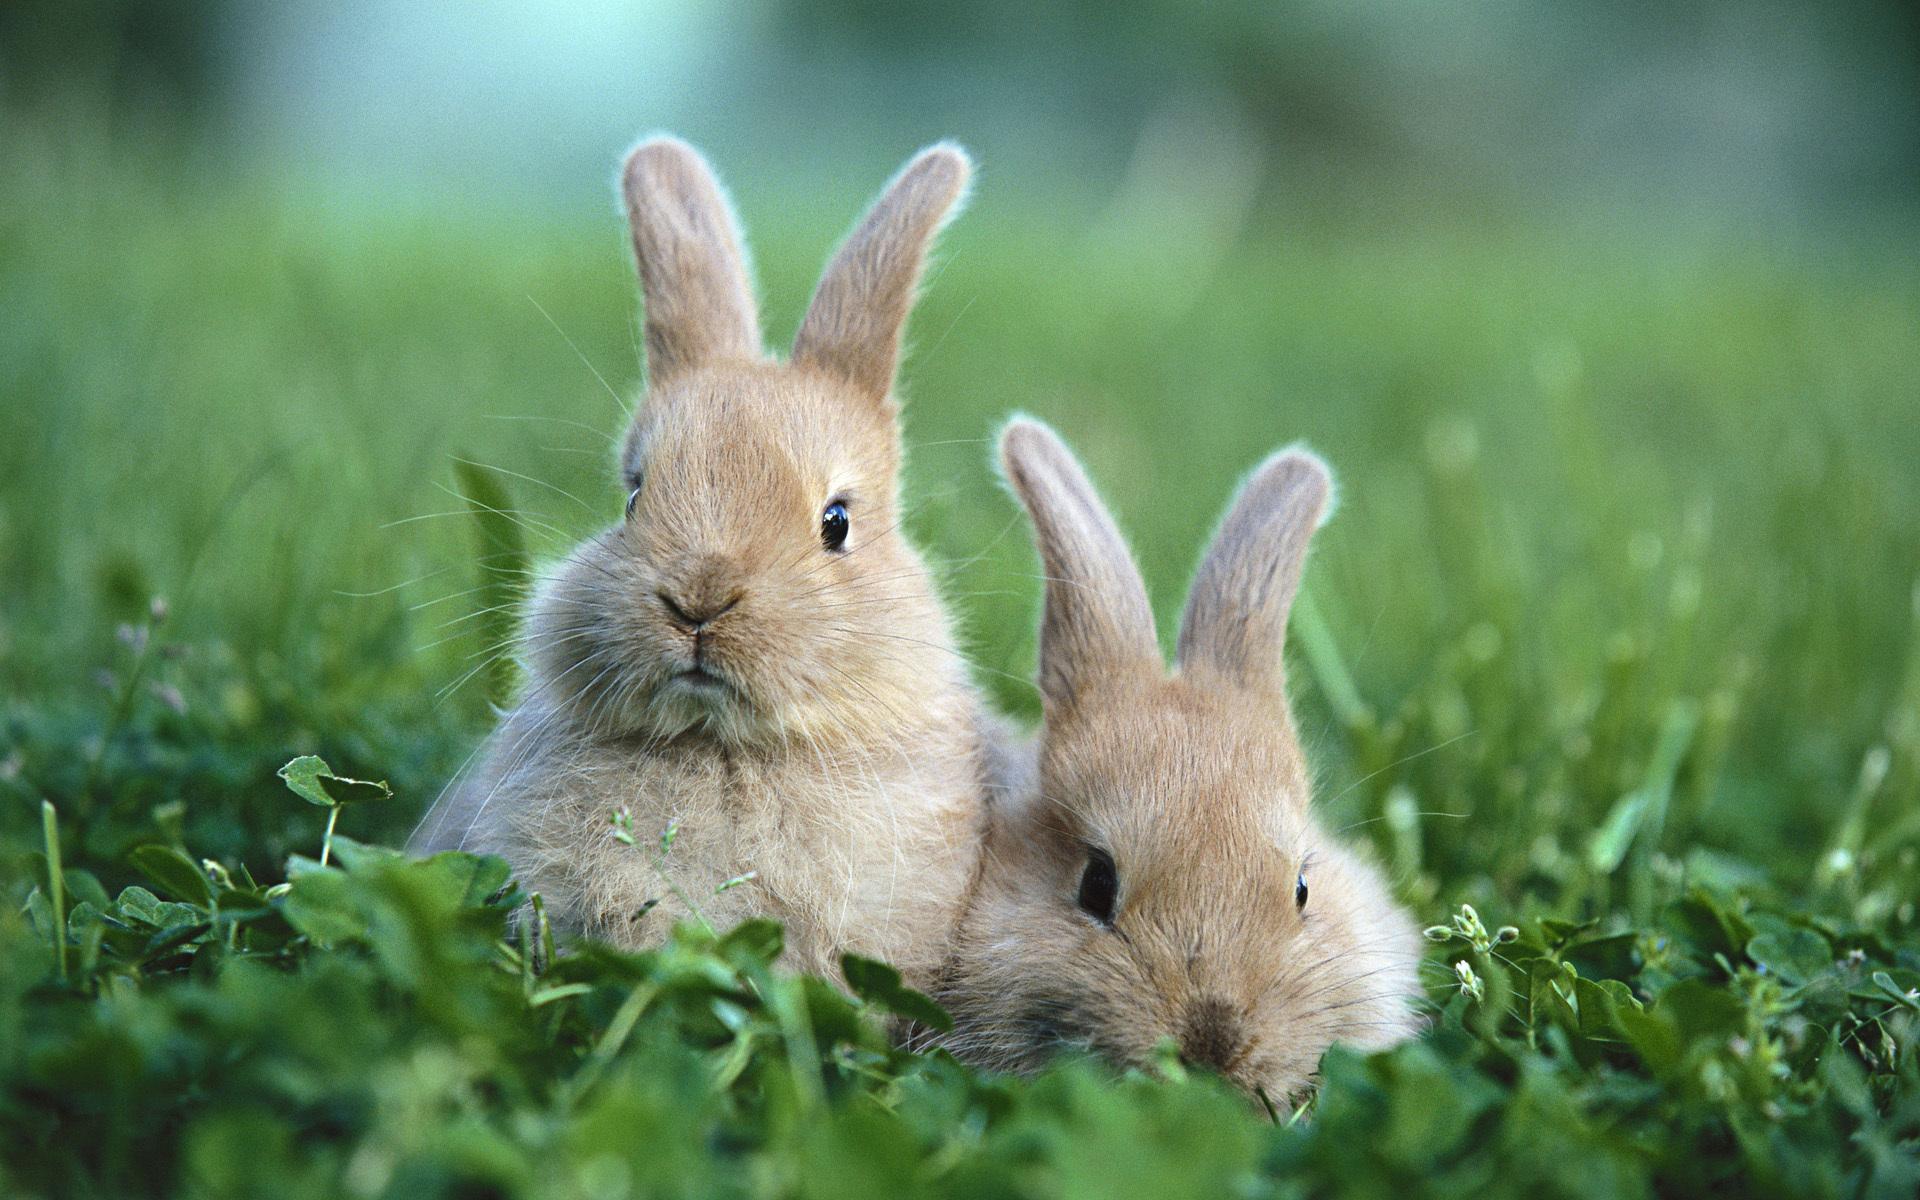 rabbit images free download